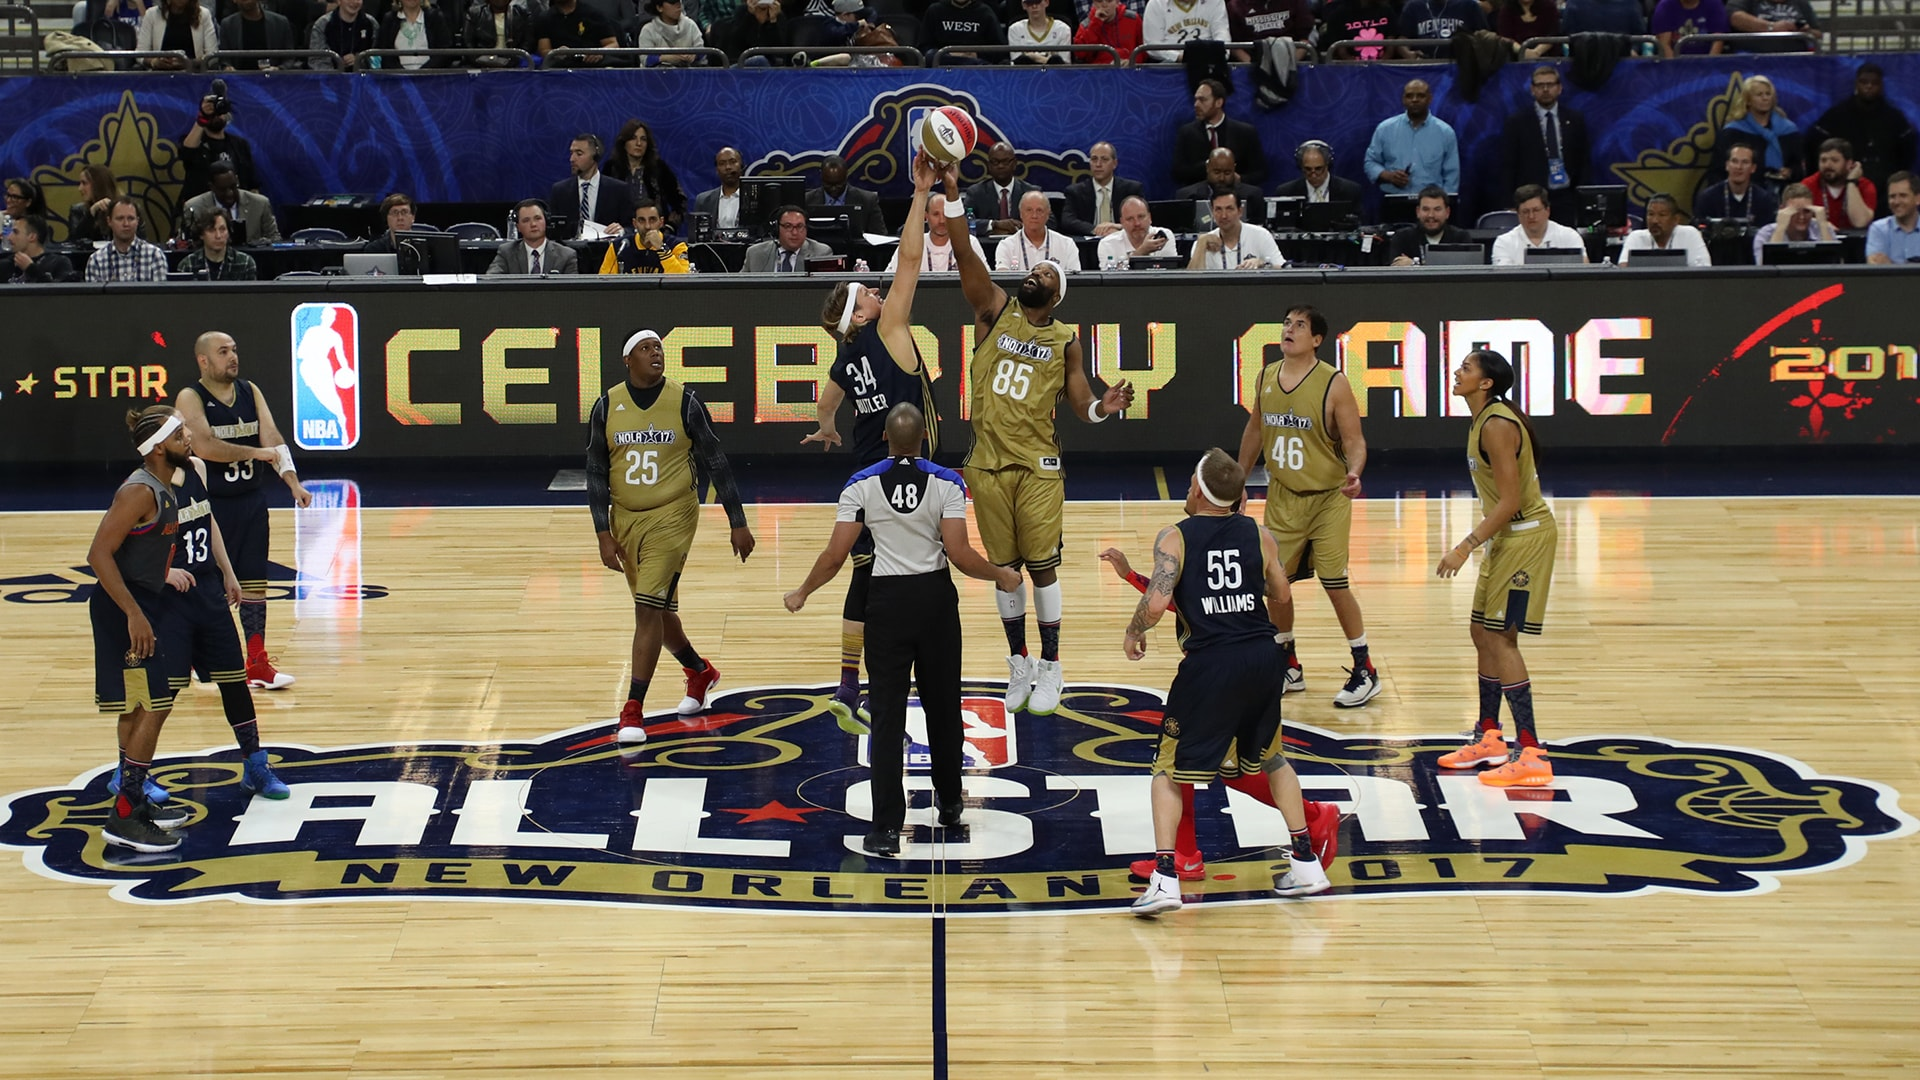 NBA Game Highlights - NBA Videos and Highlights